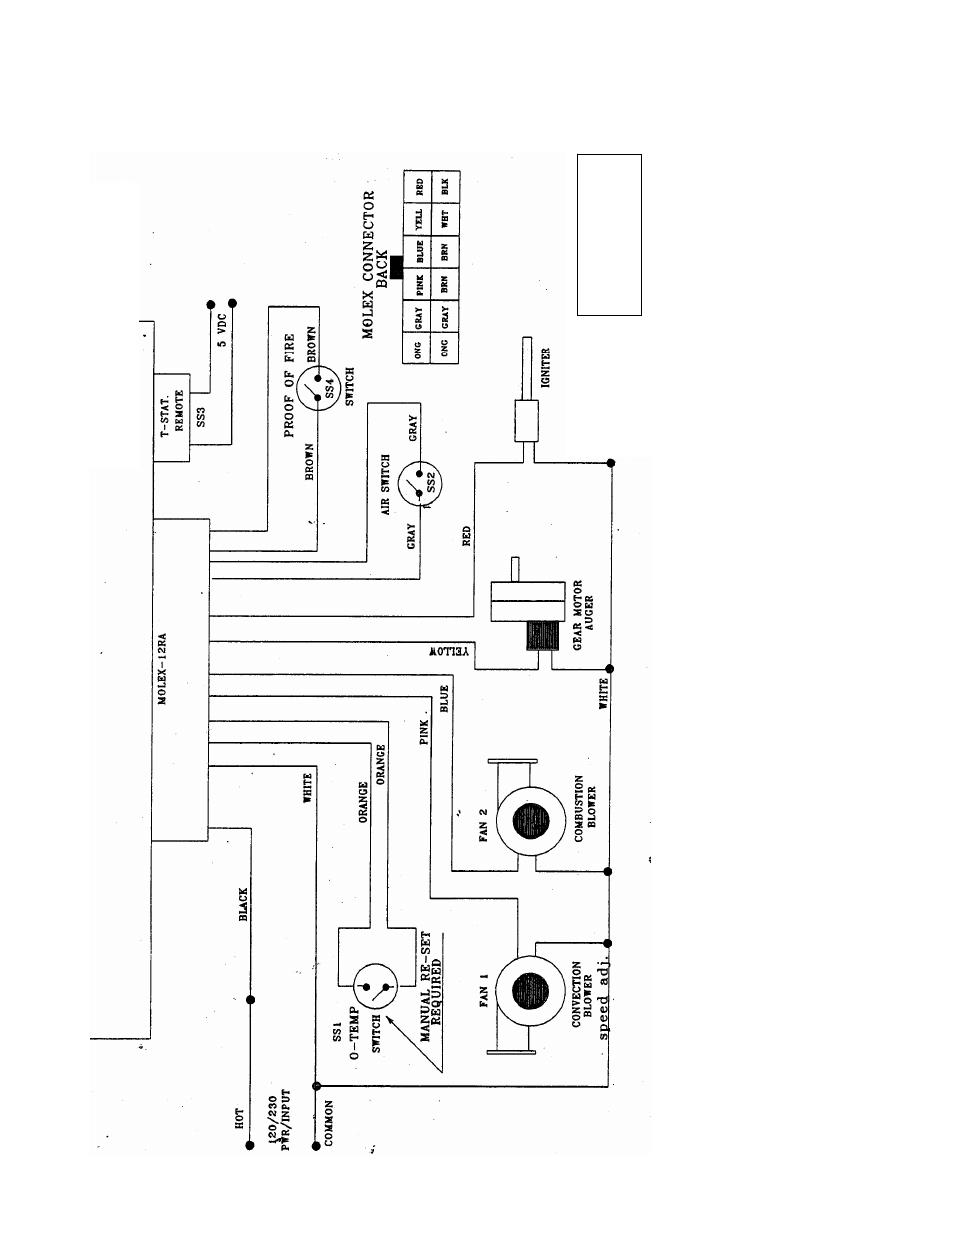 hight resolution of ac model wiring diagram warning dc model ddc 3000 wiringac model wiring diagram warning